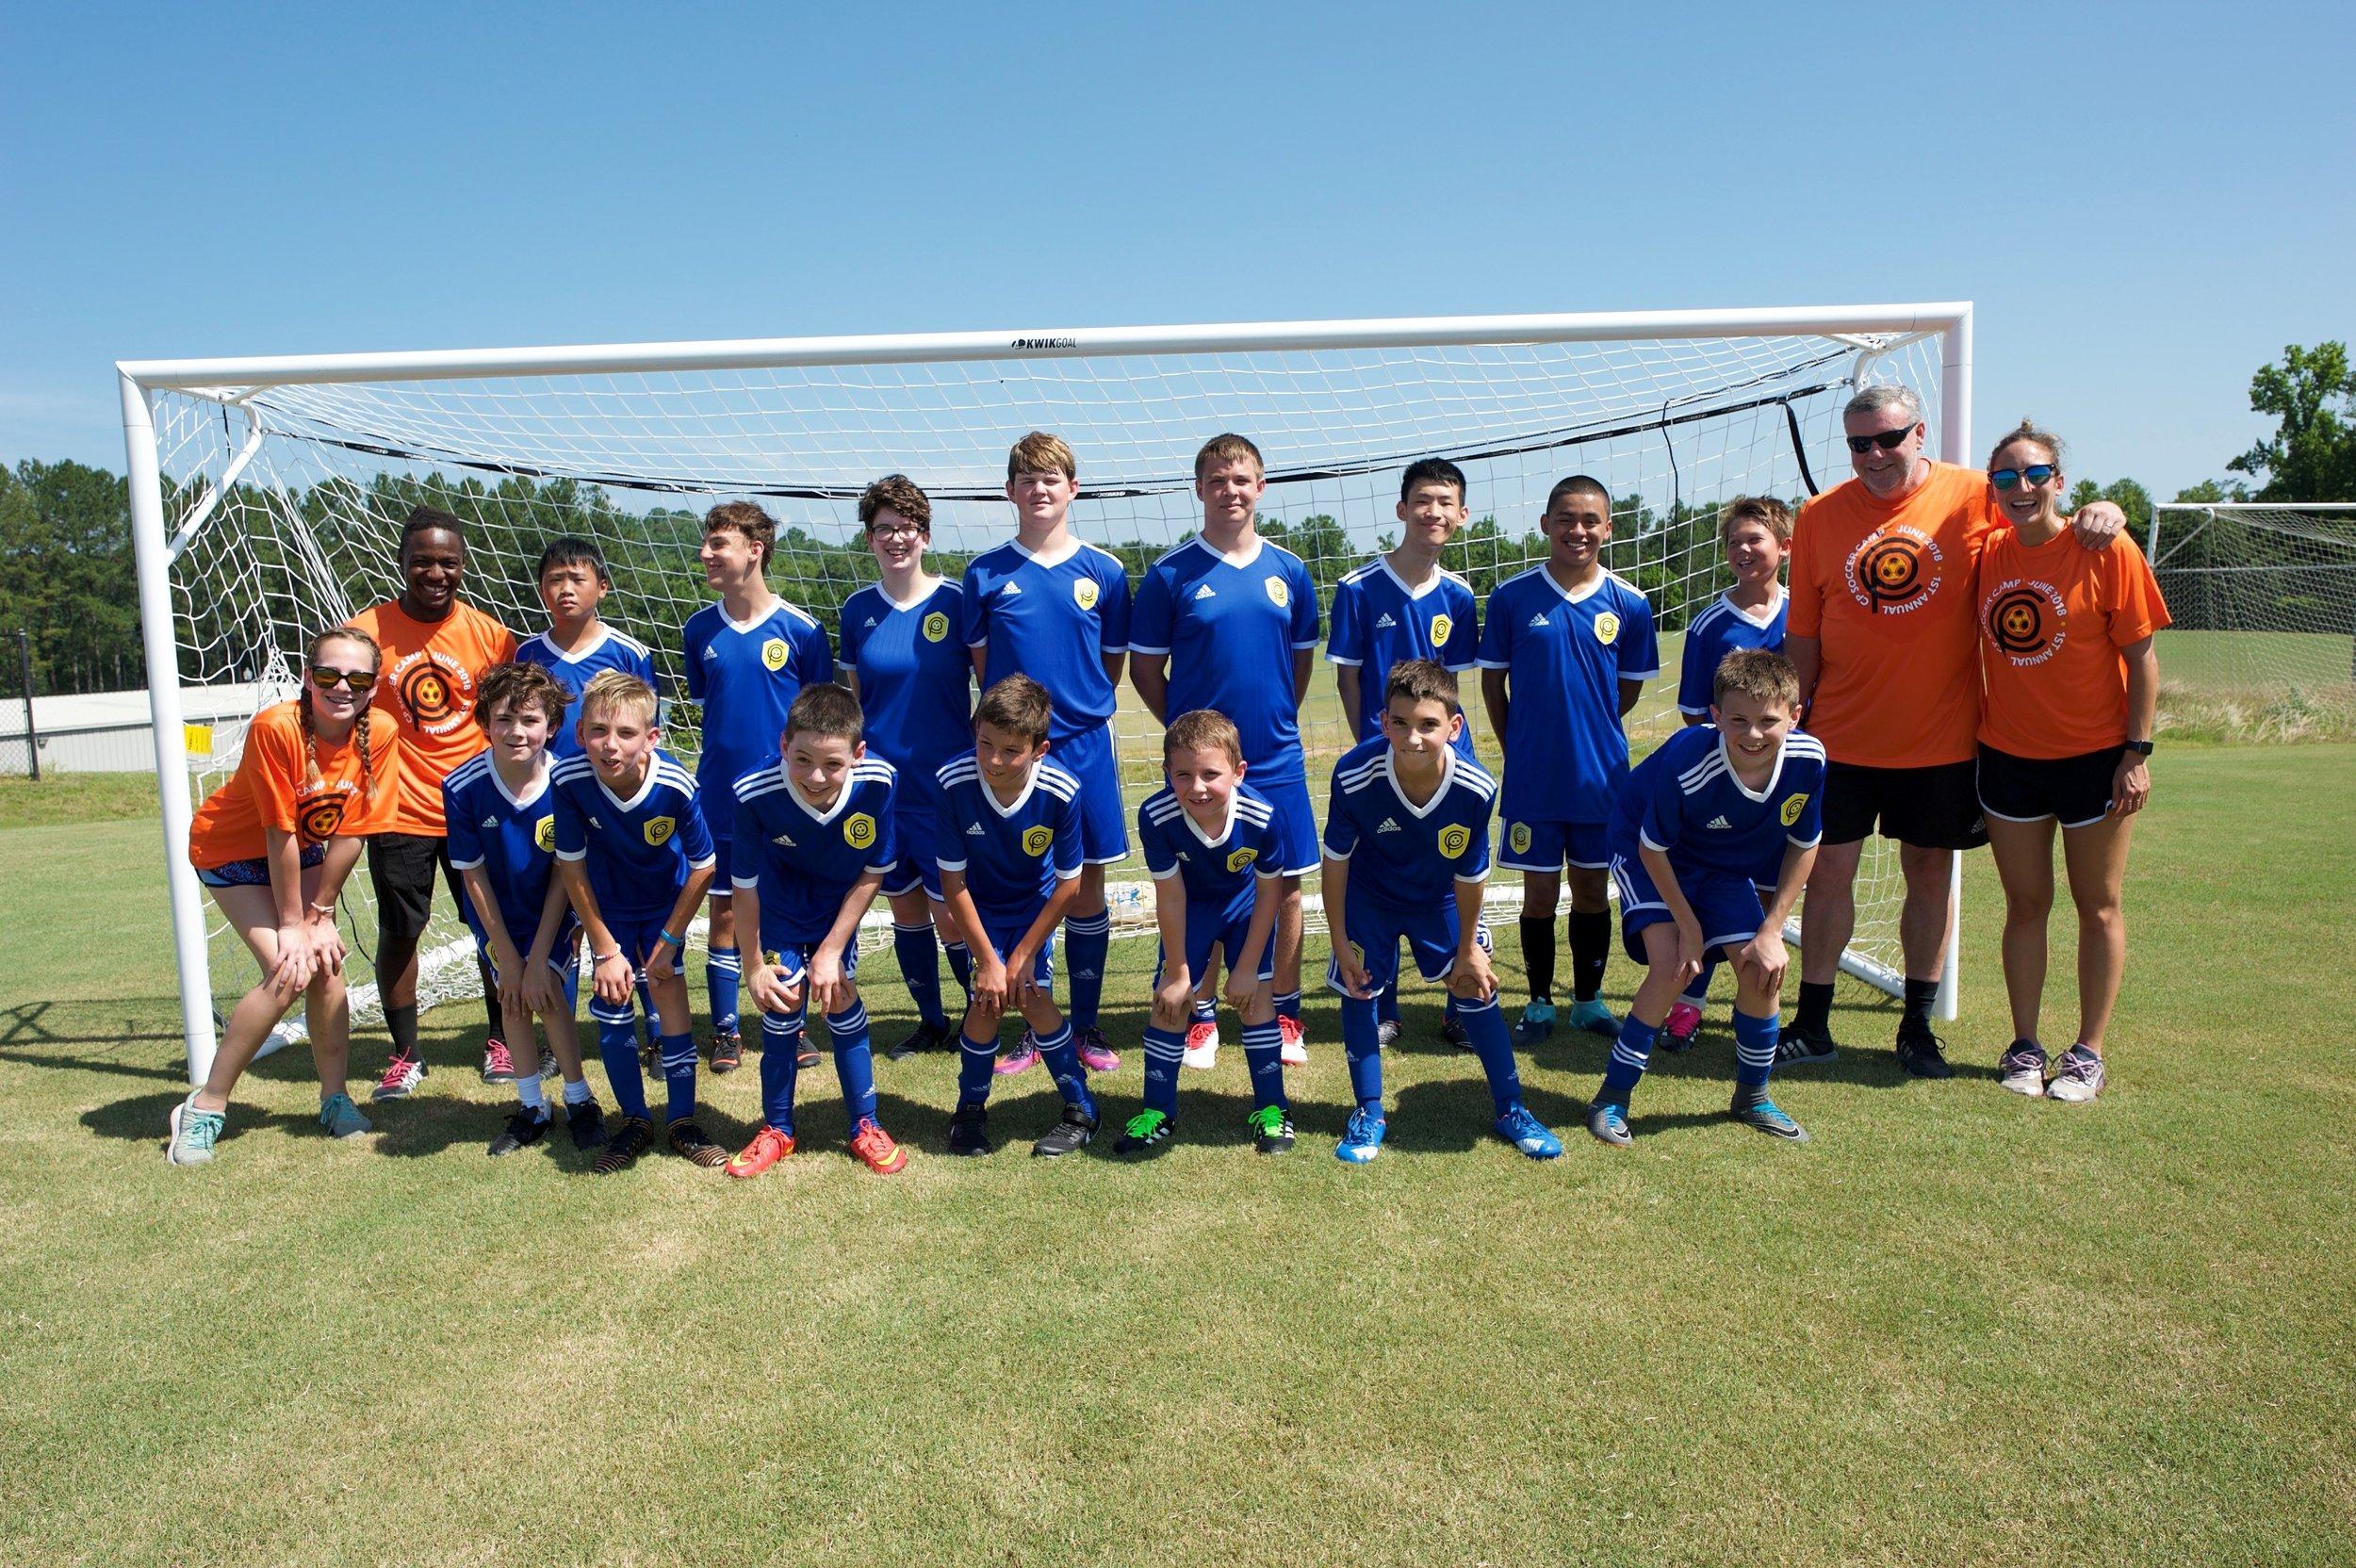 CP Soccer Camp 2018, Clemson Univeristy, SC